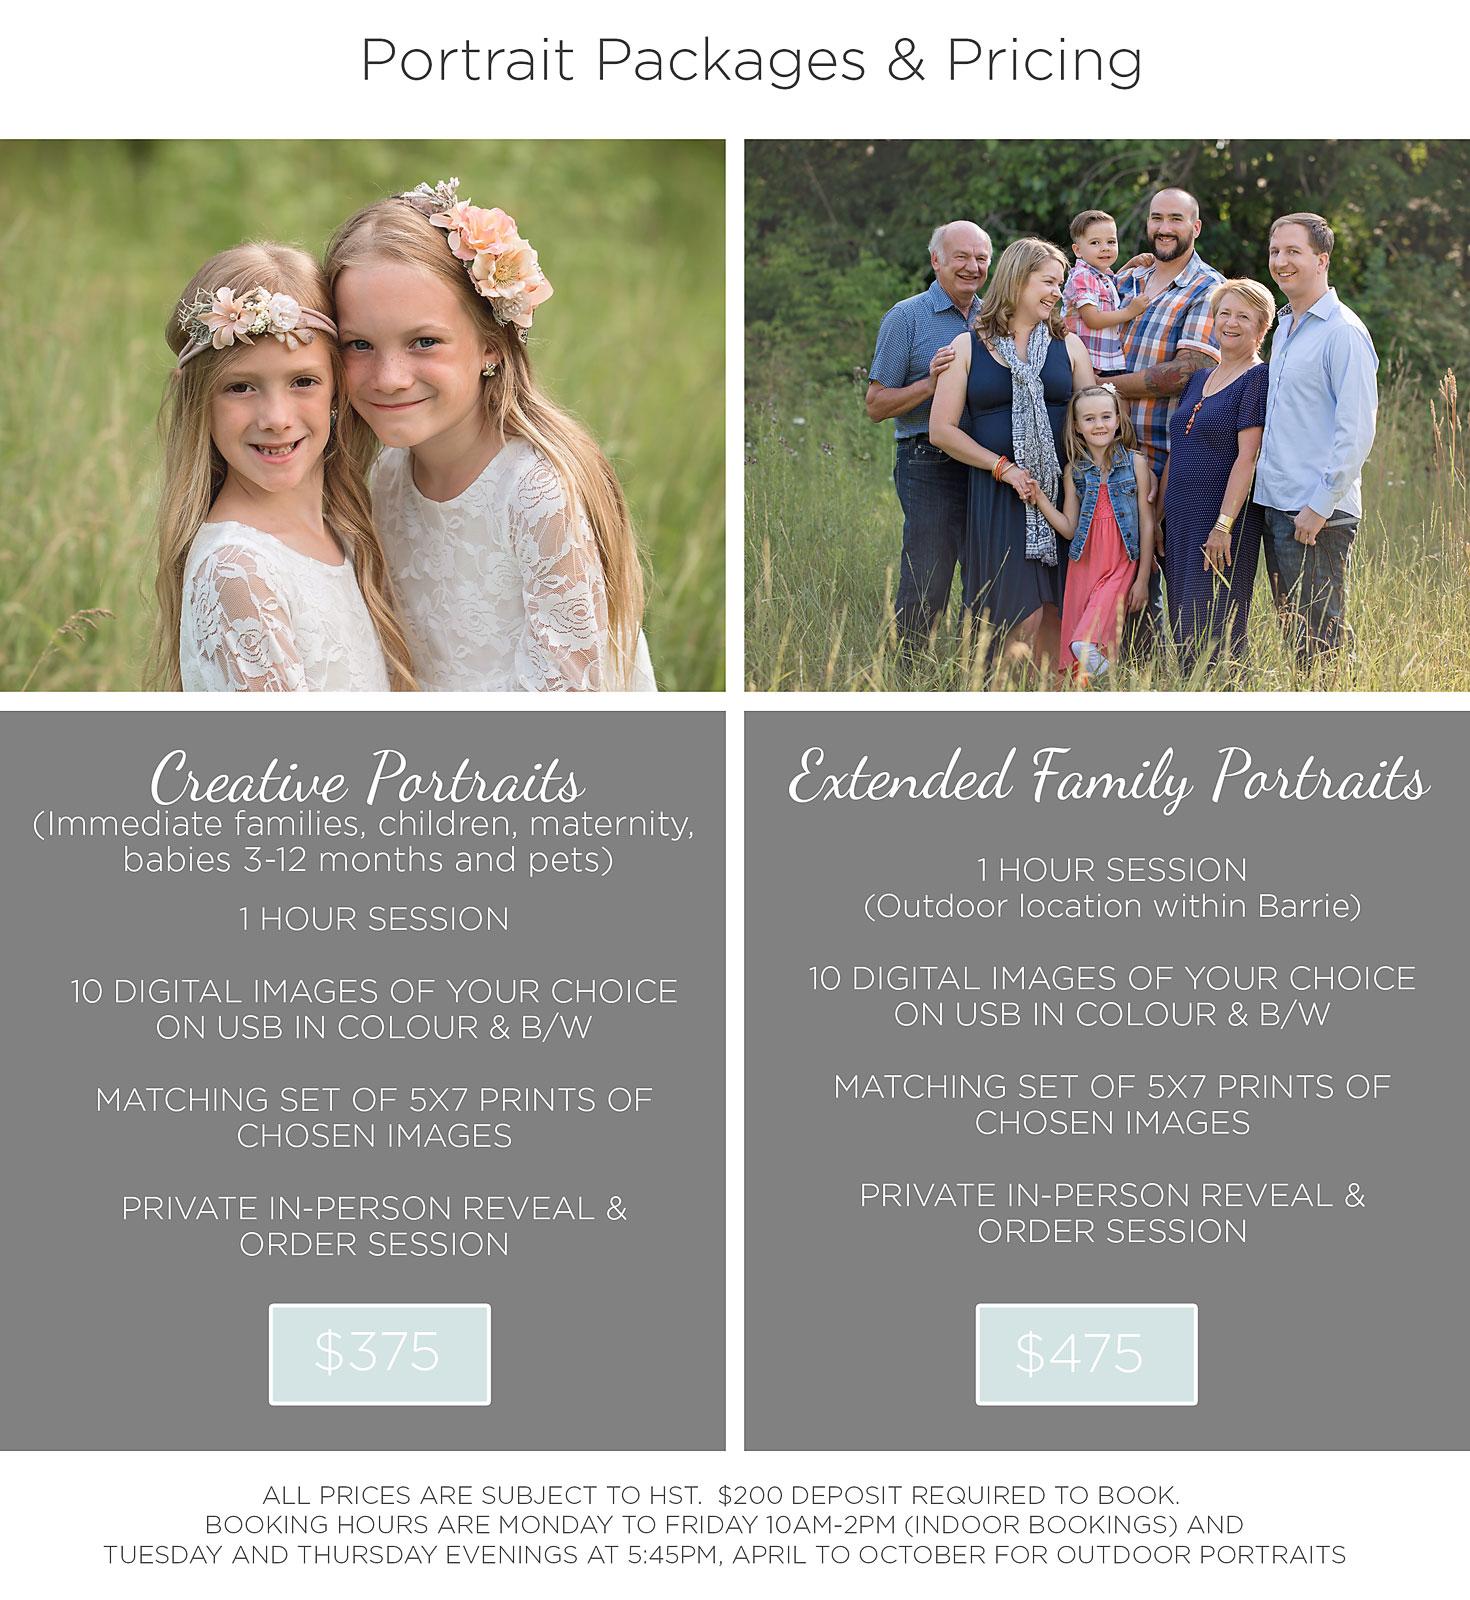 Raindance Photography | Raindance Photography | Pricing